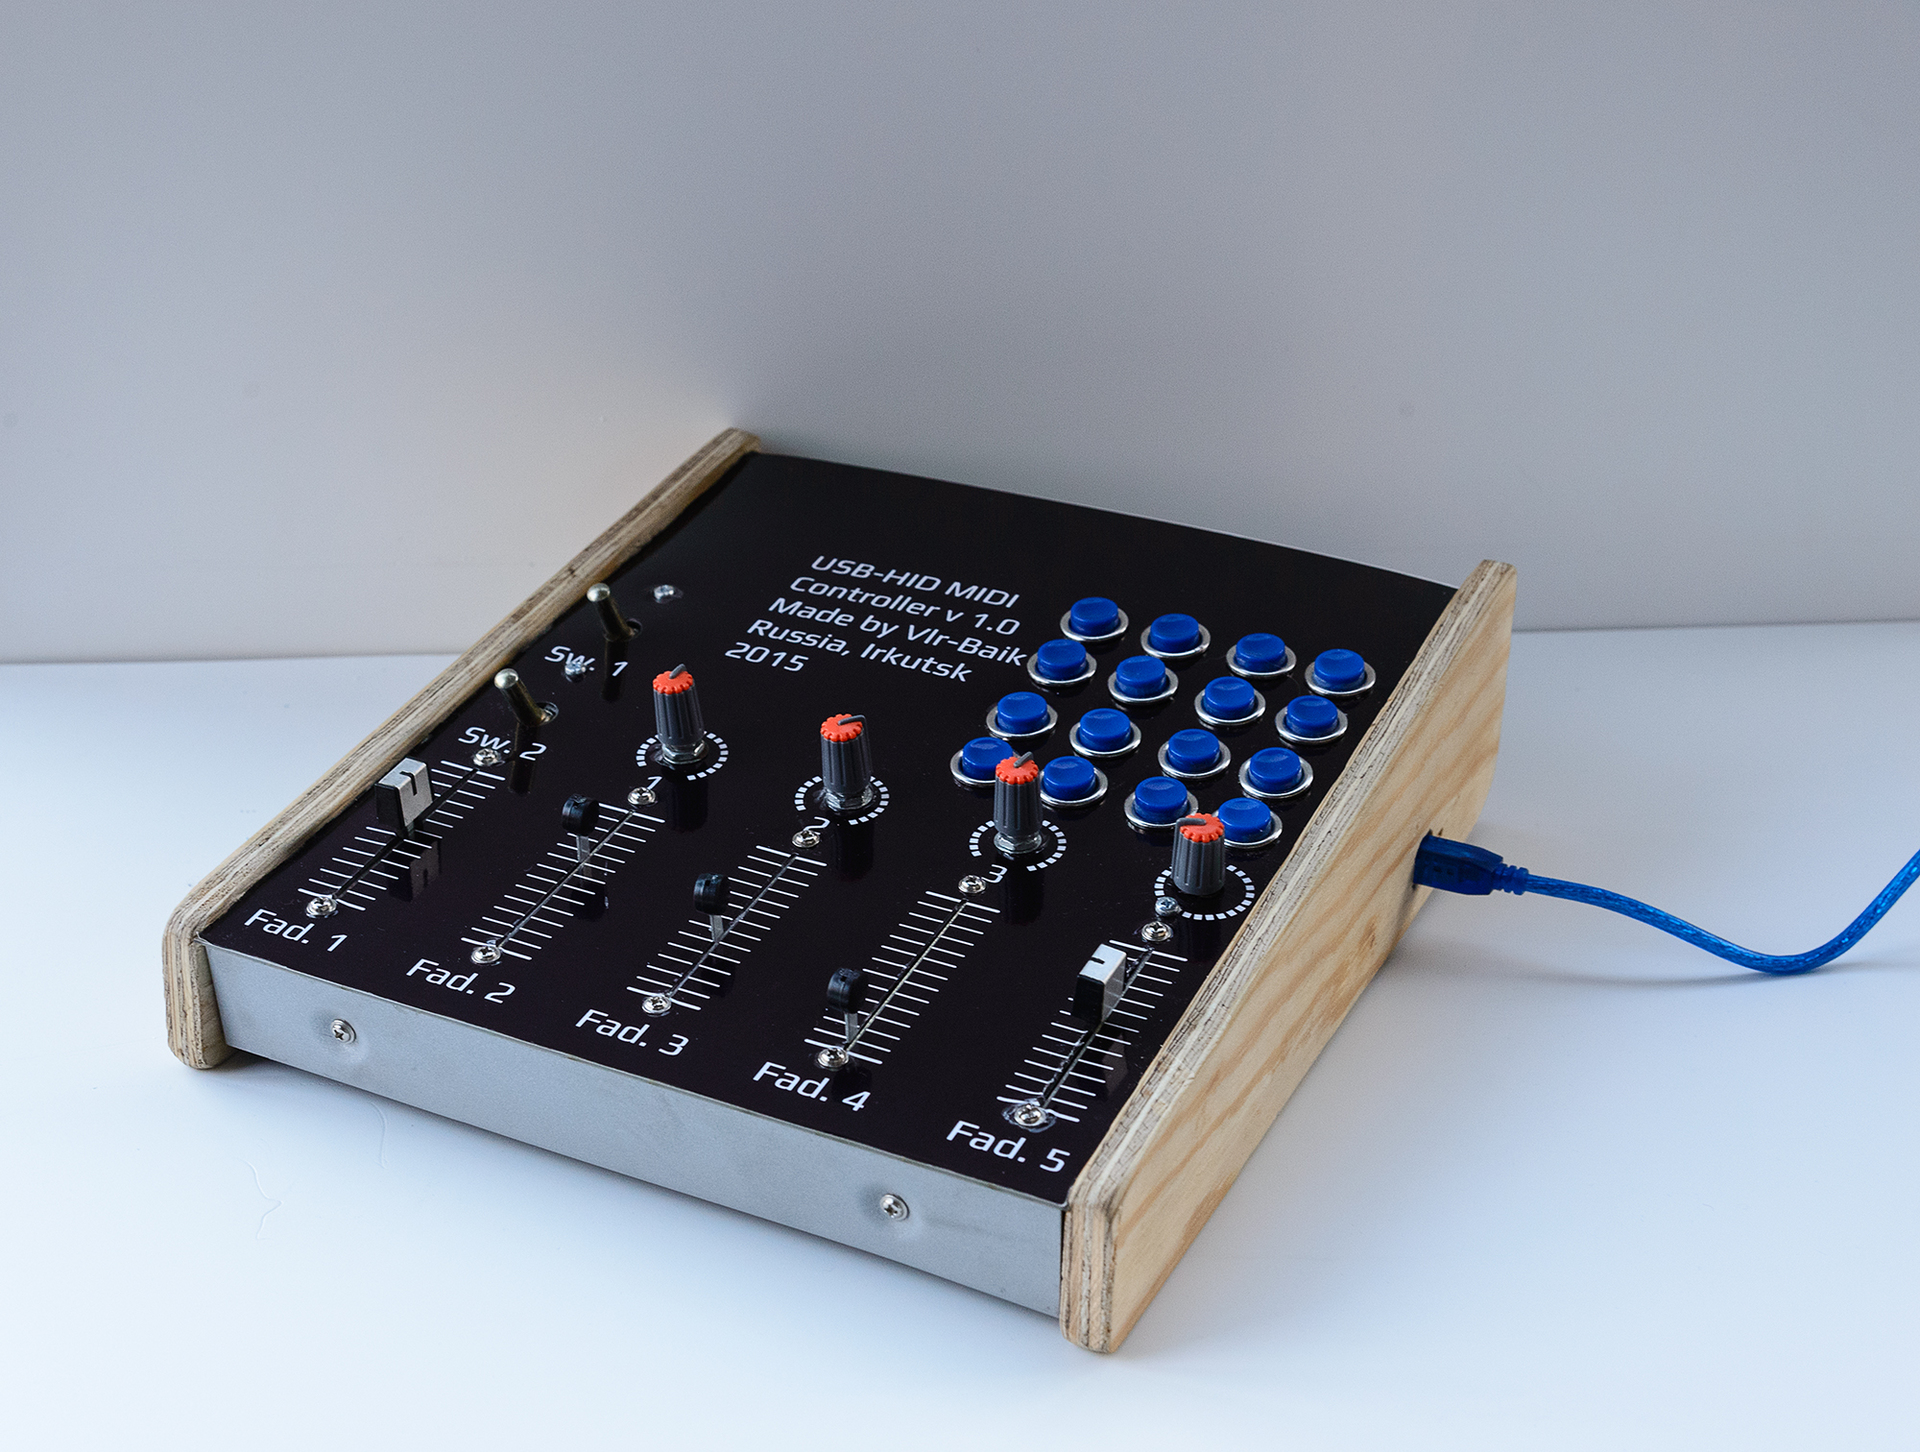 MIDI -контроллеры и примочки 17